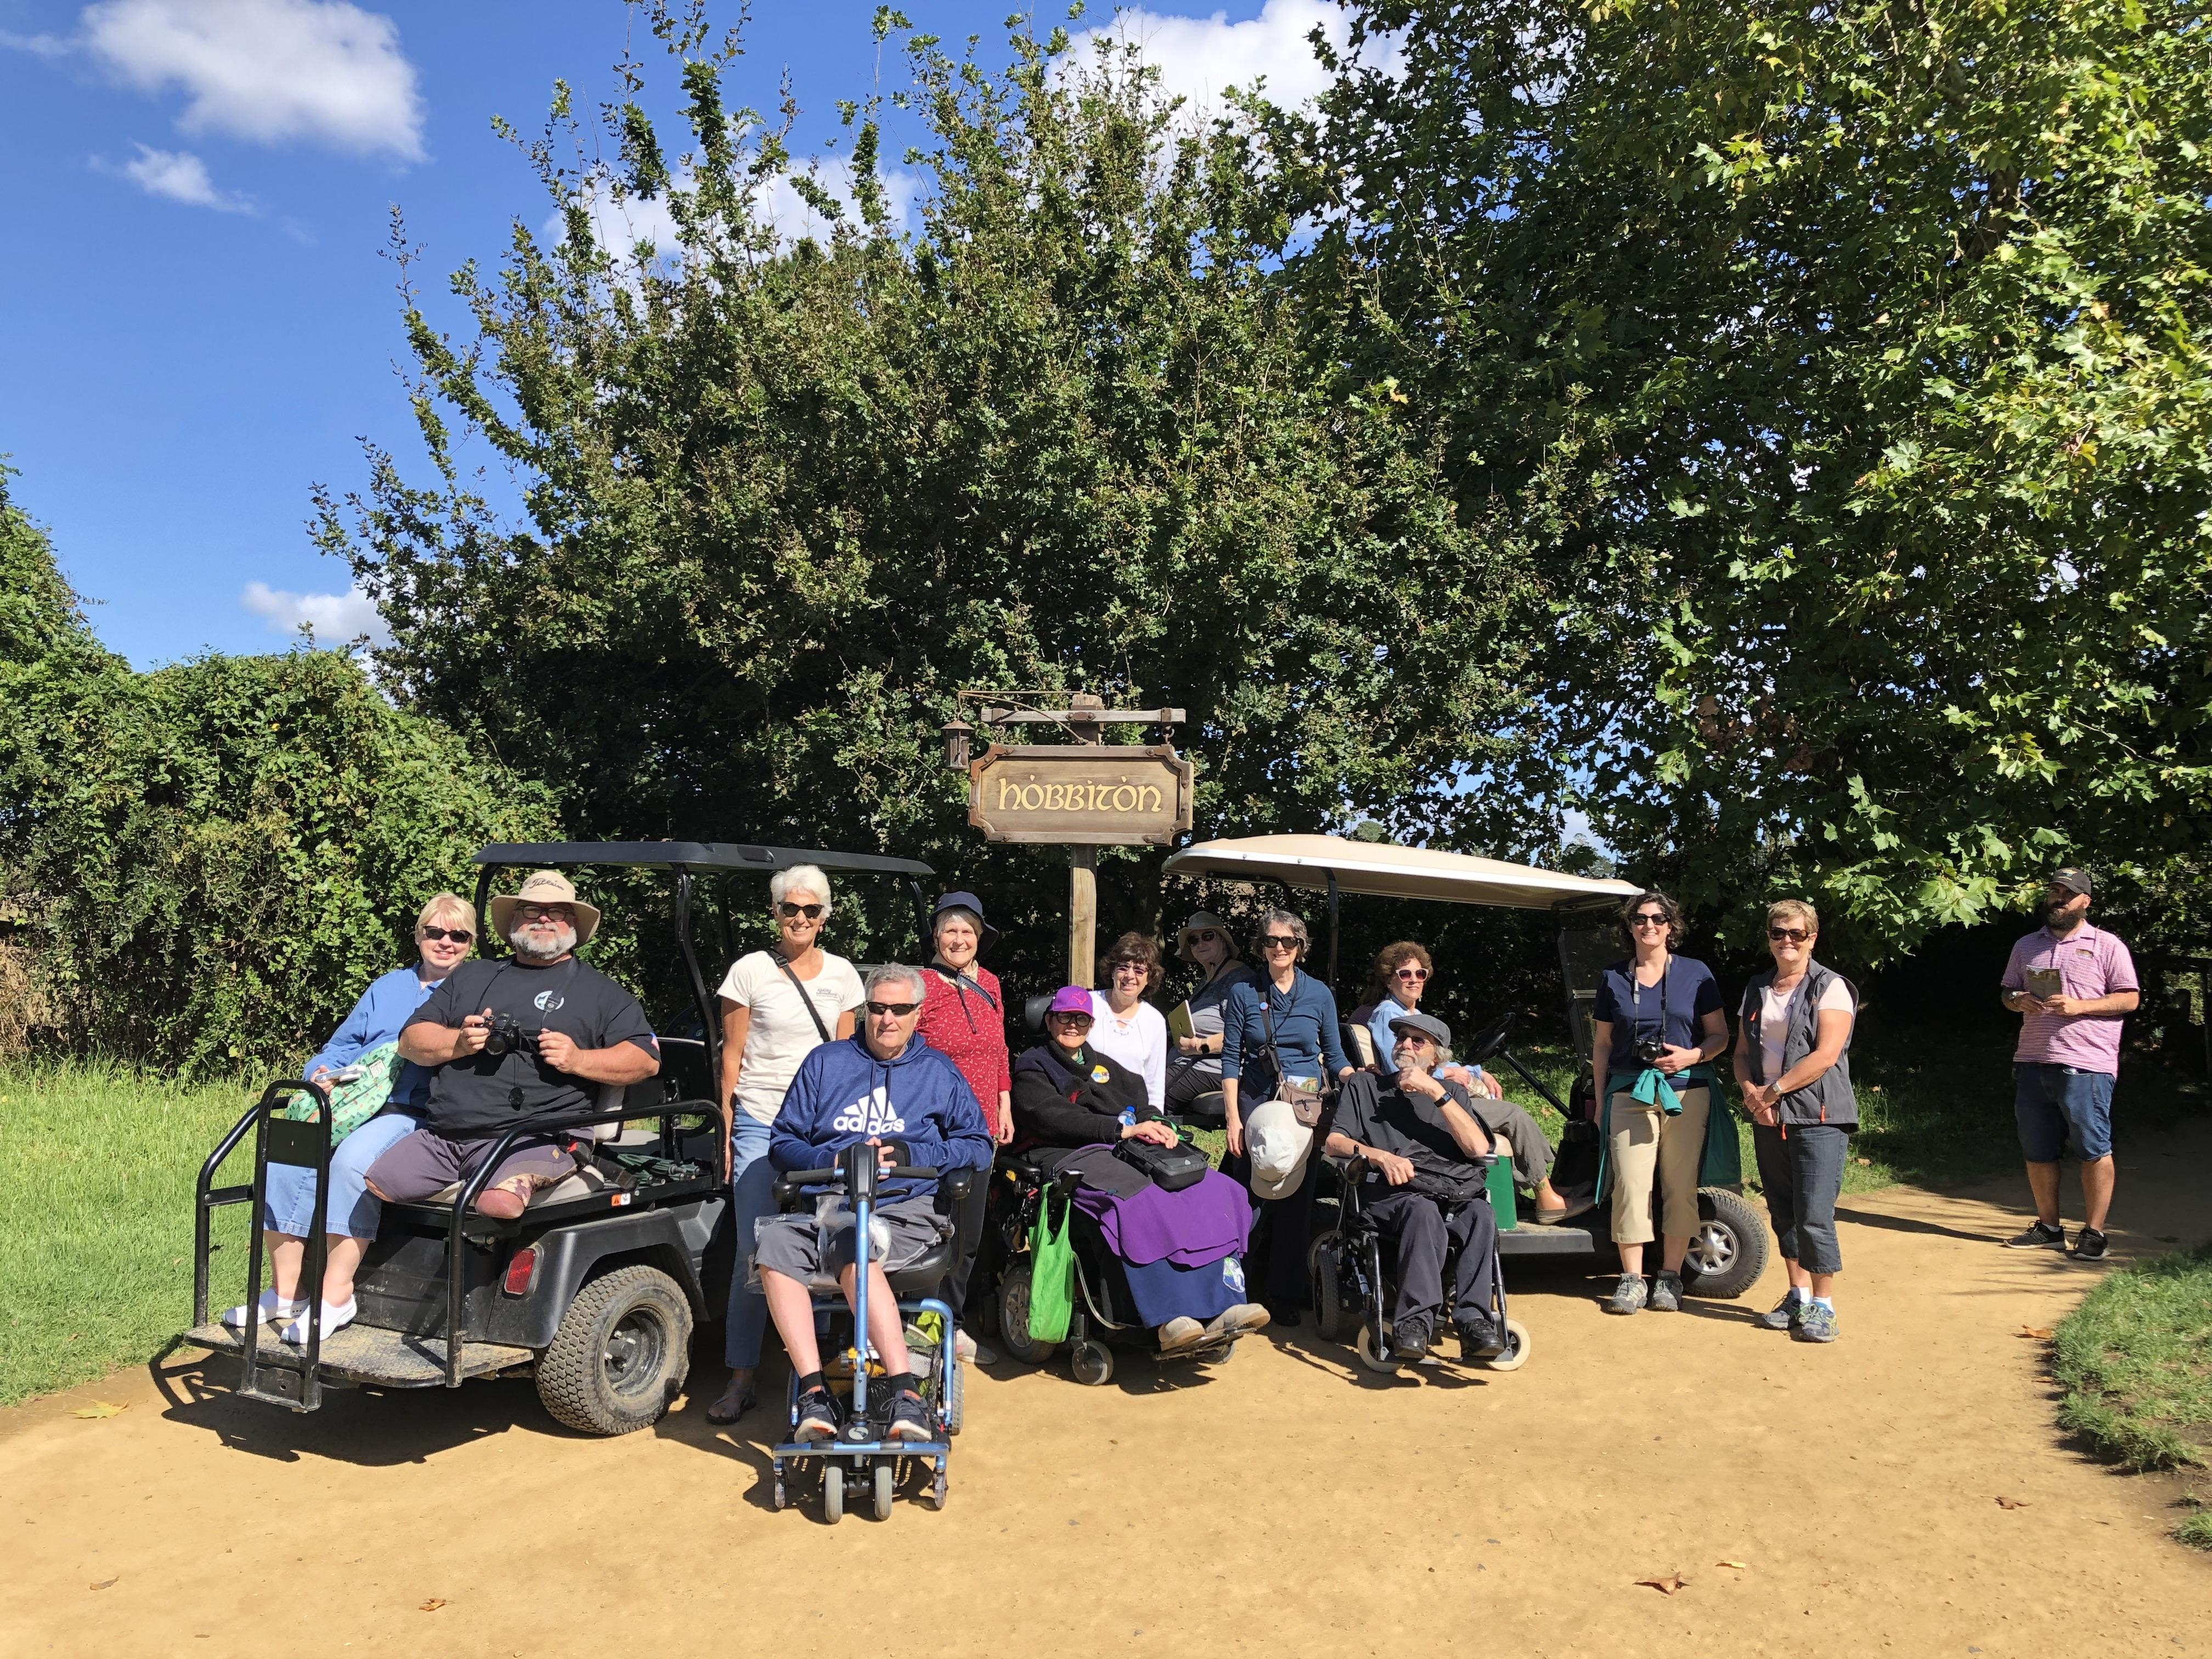 Accessible tour group visiting Hobbiton